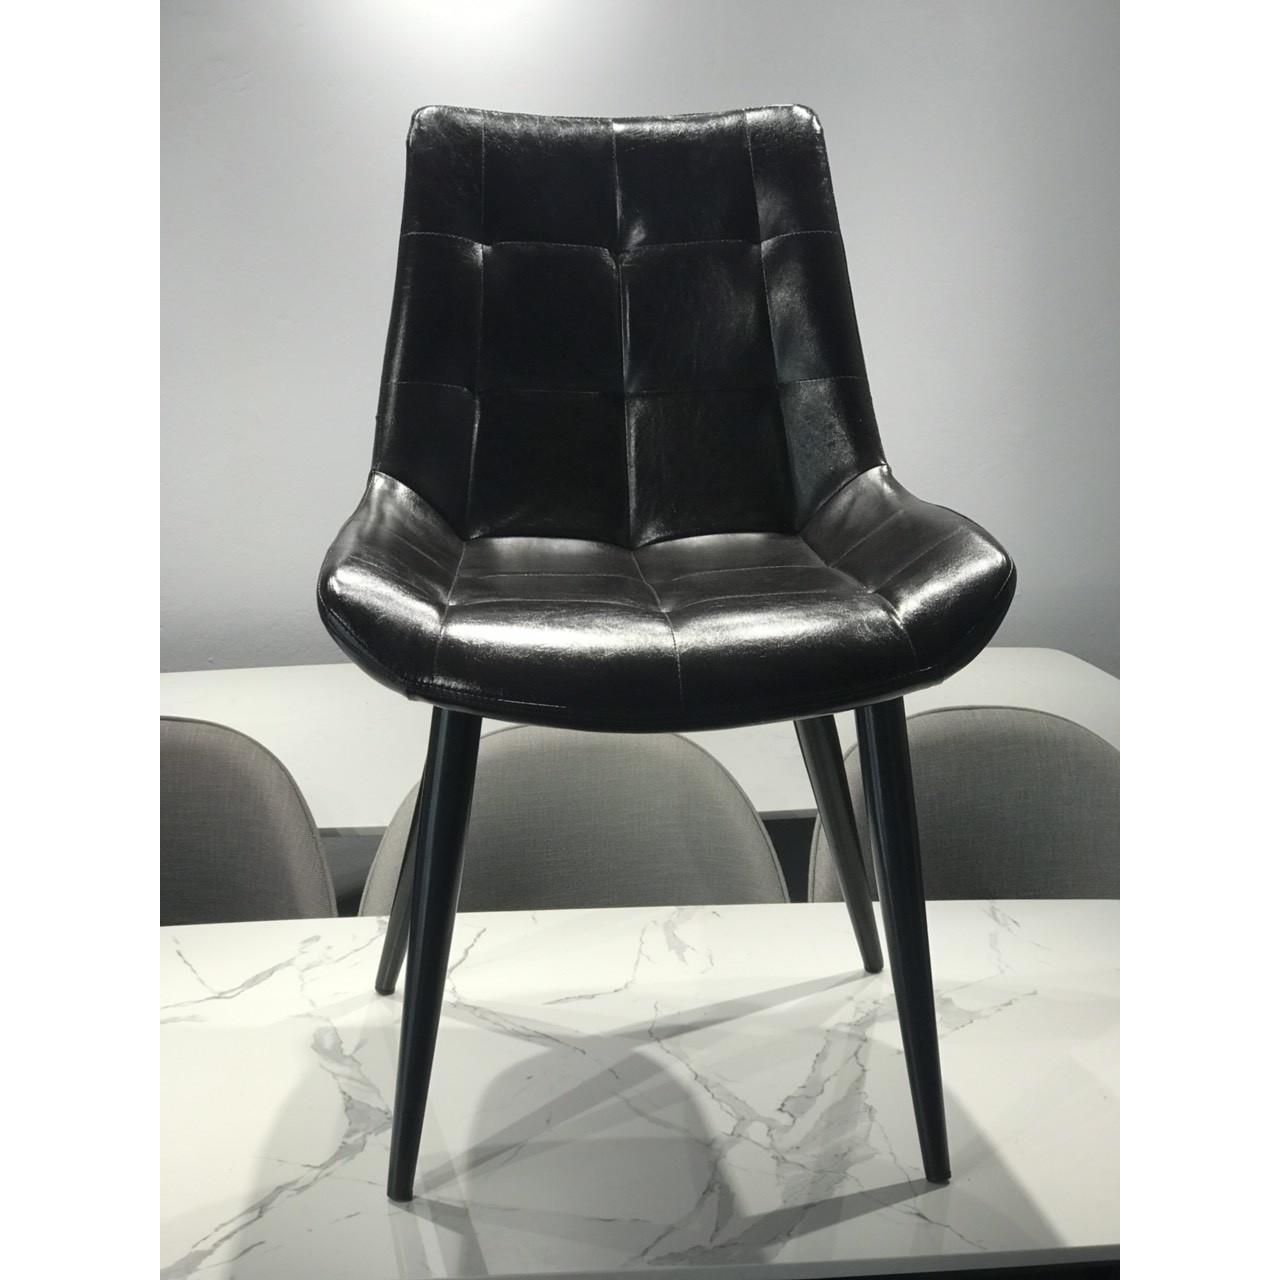 Ghế ăn mặt da - Ghế ăn 3B6809 -  - chân sắt sơn tĩnh điện